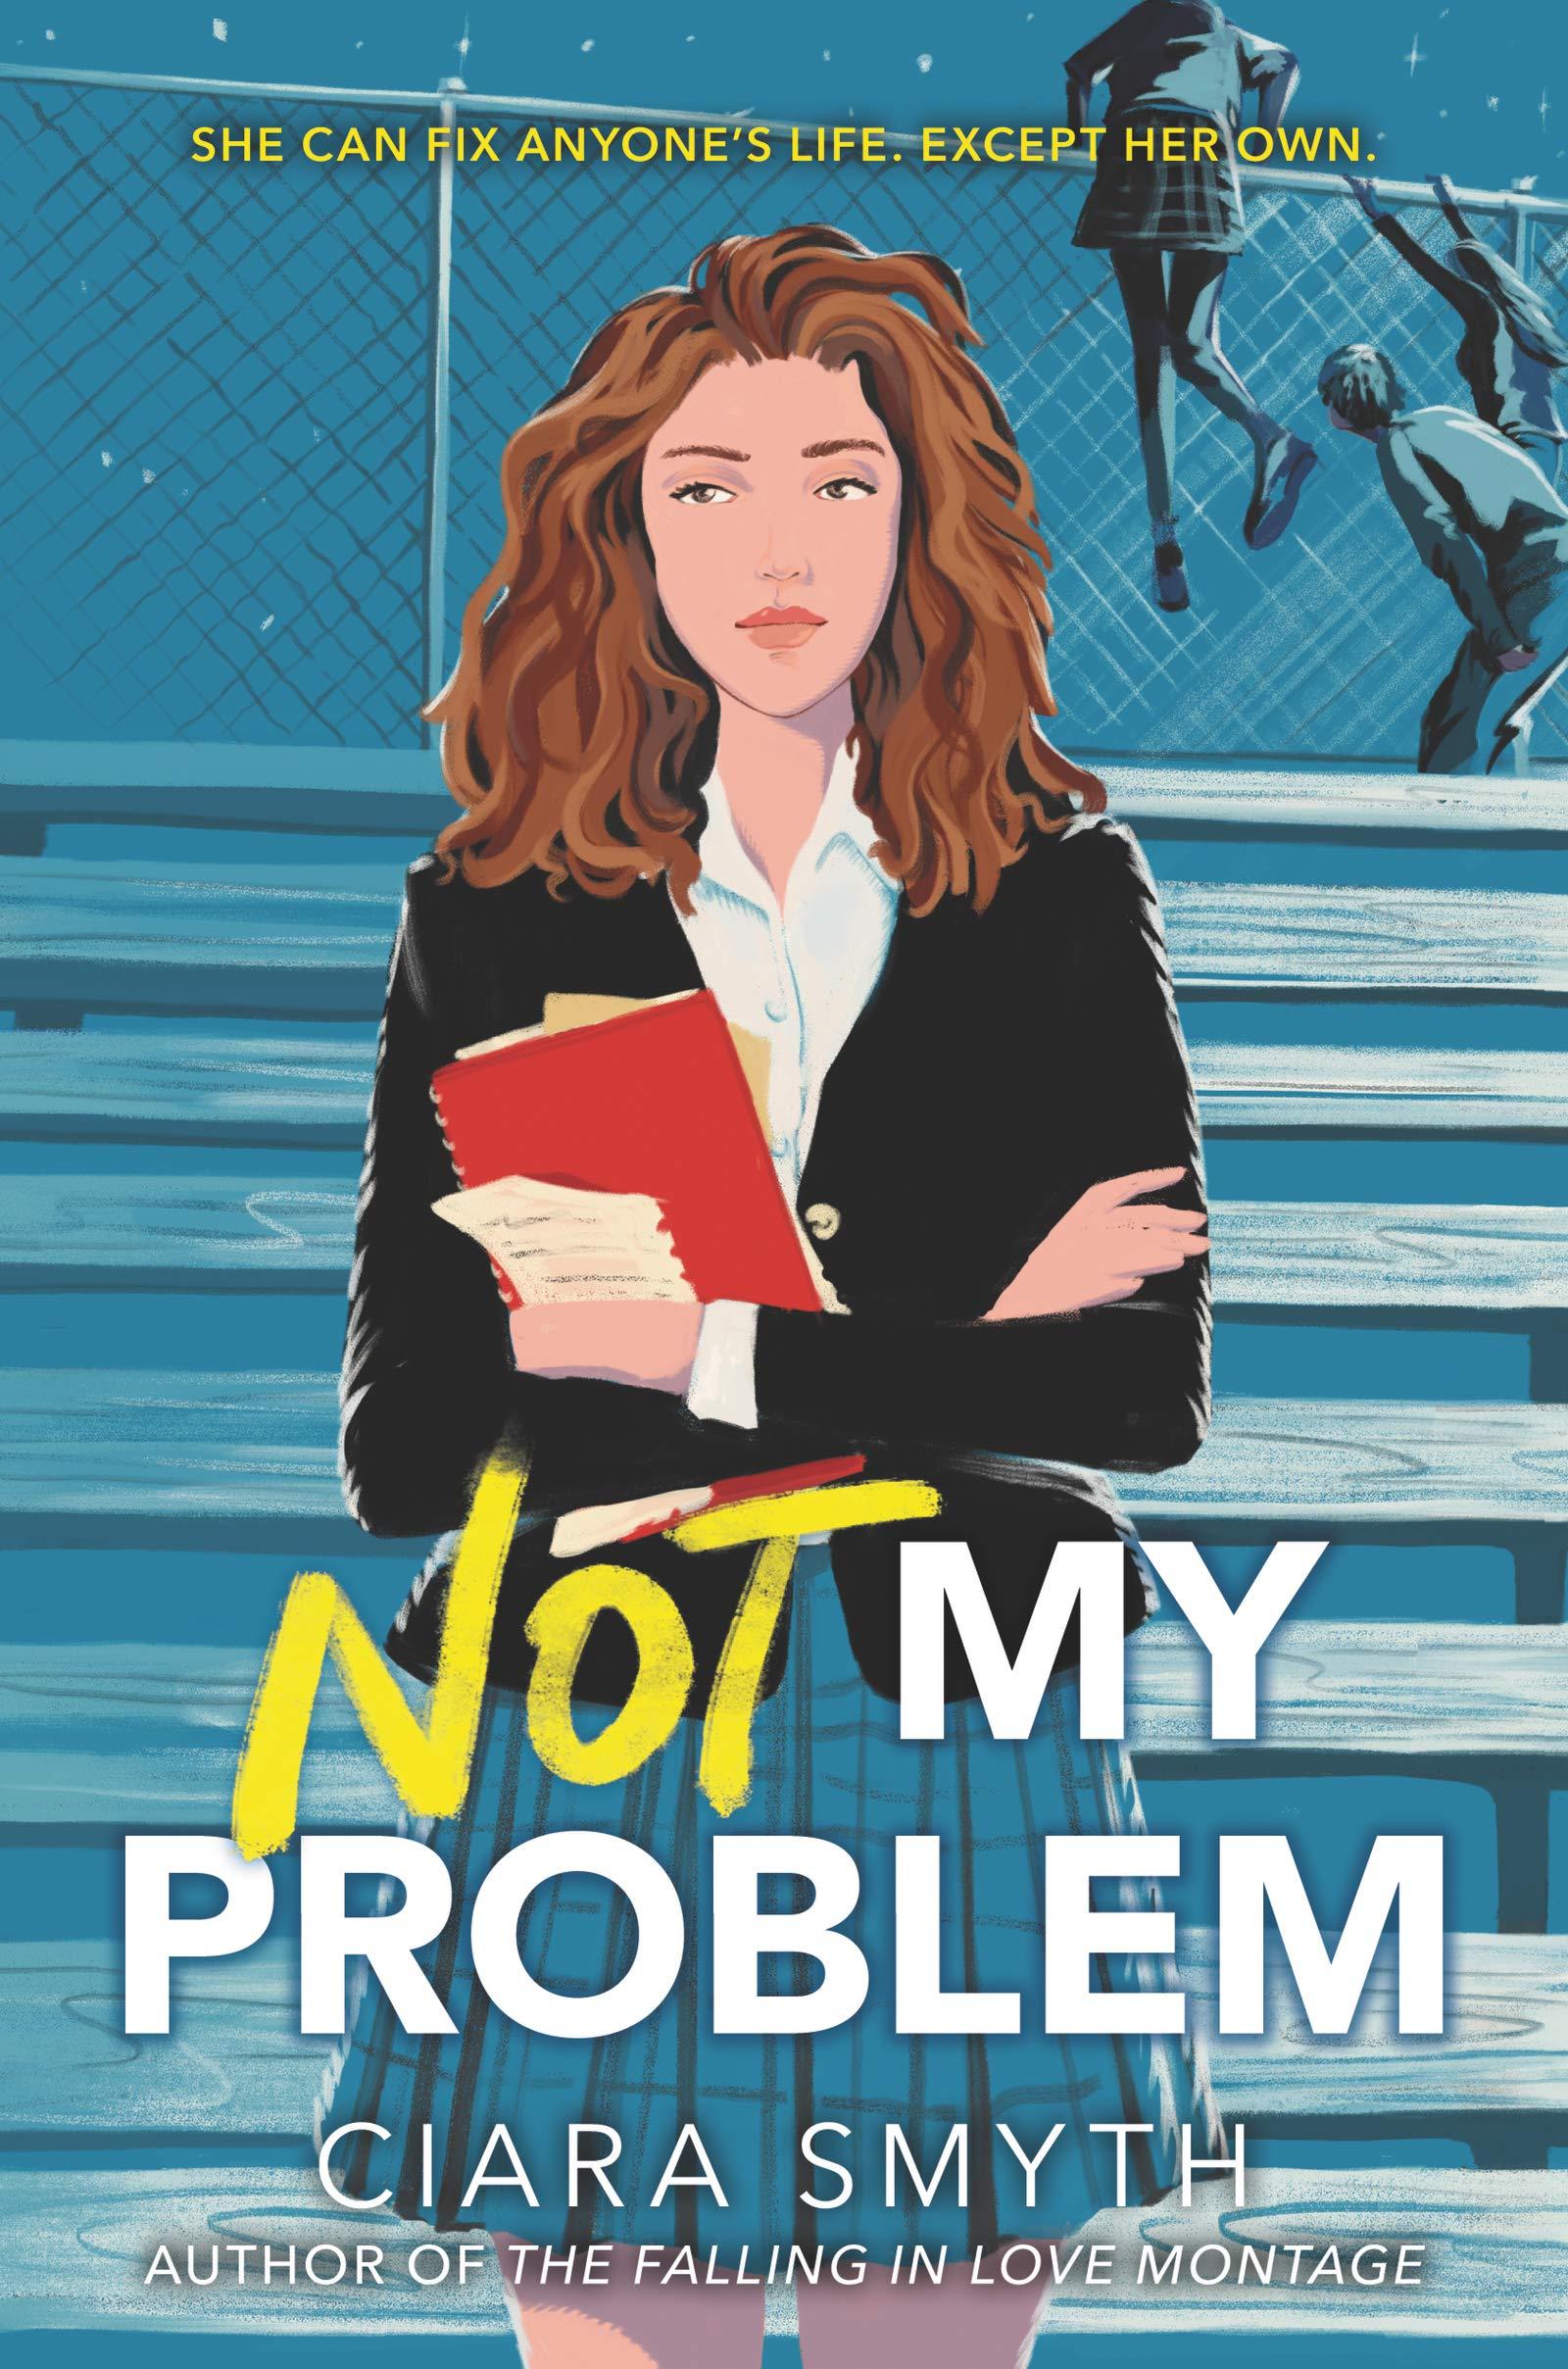 Not My Problem: Smyth, Ciara: 9780062957146: Amazon.com: Books